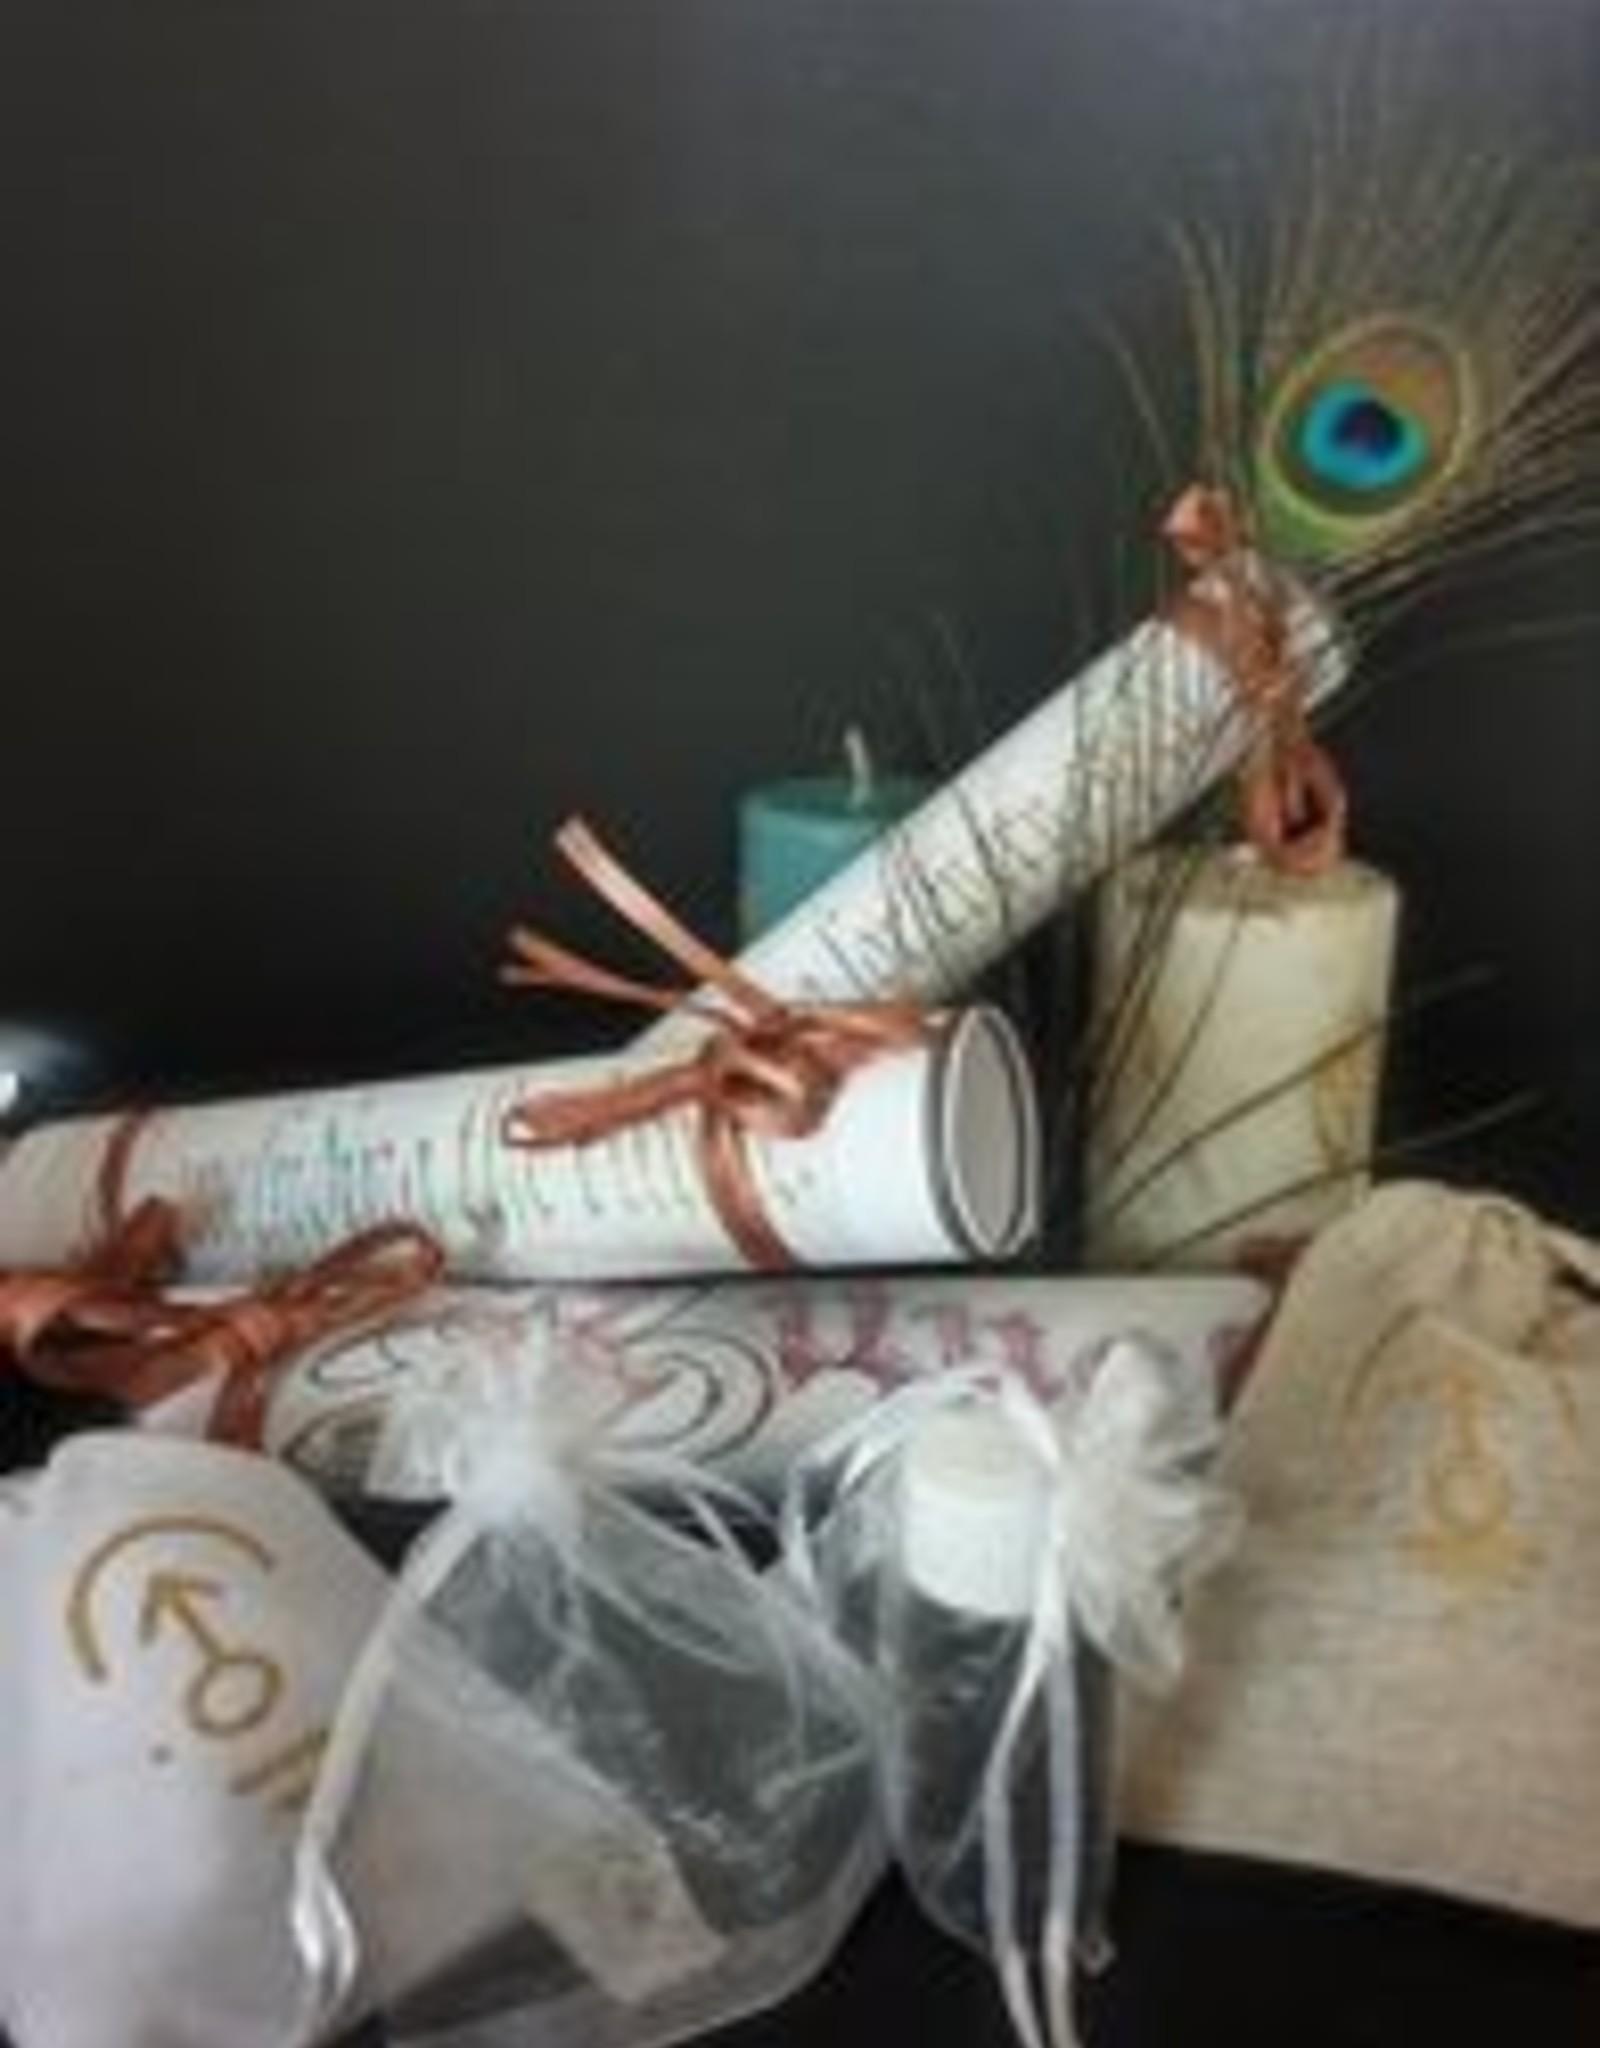 seazido - wevyra apply for your happiness